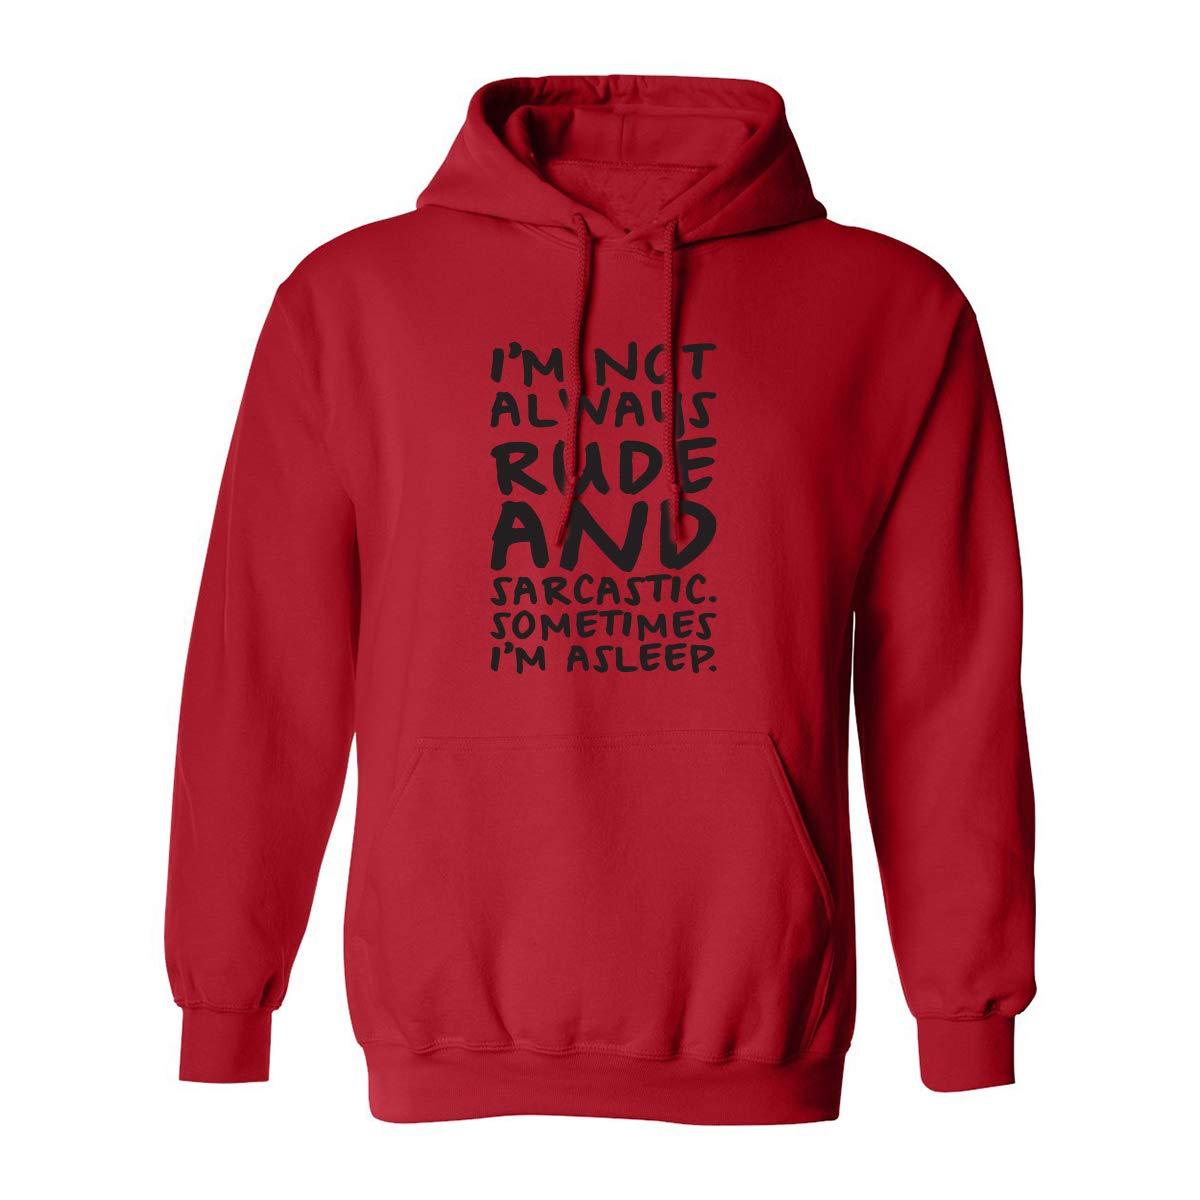 Im Not Always Rude and Sarcastic Adult Hooded Sweatshirt